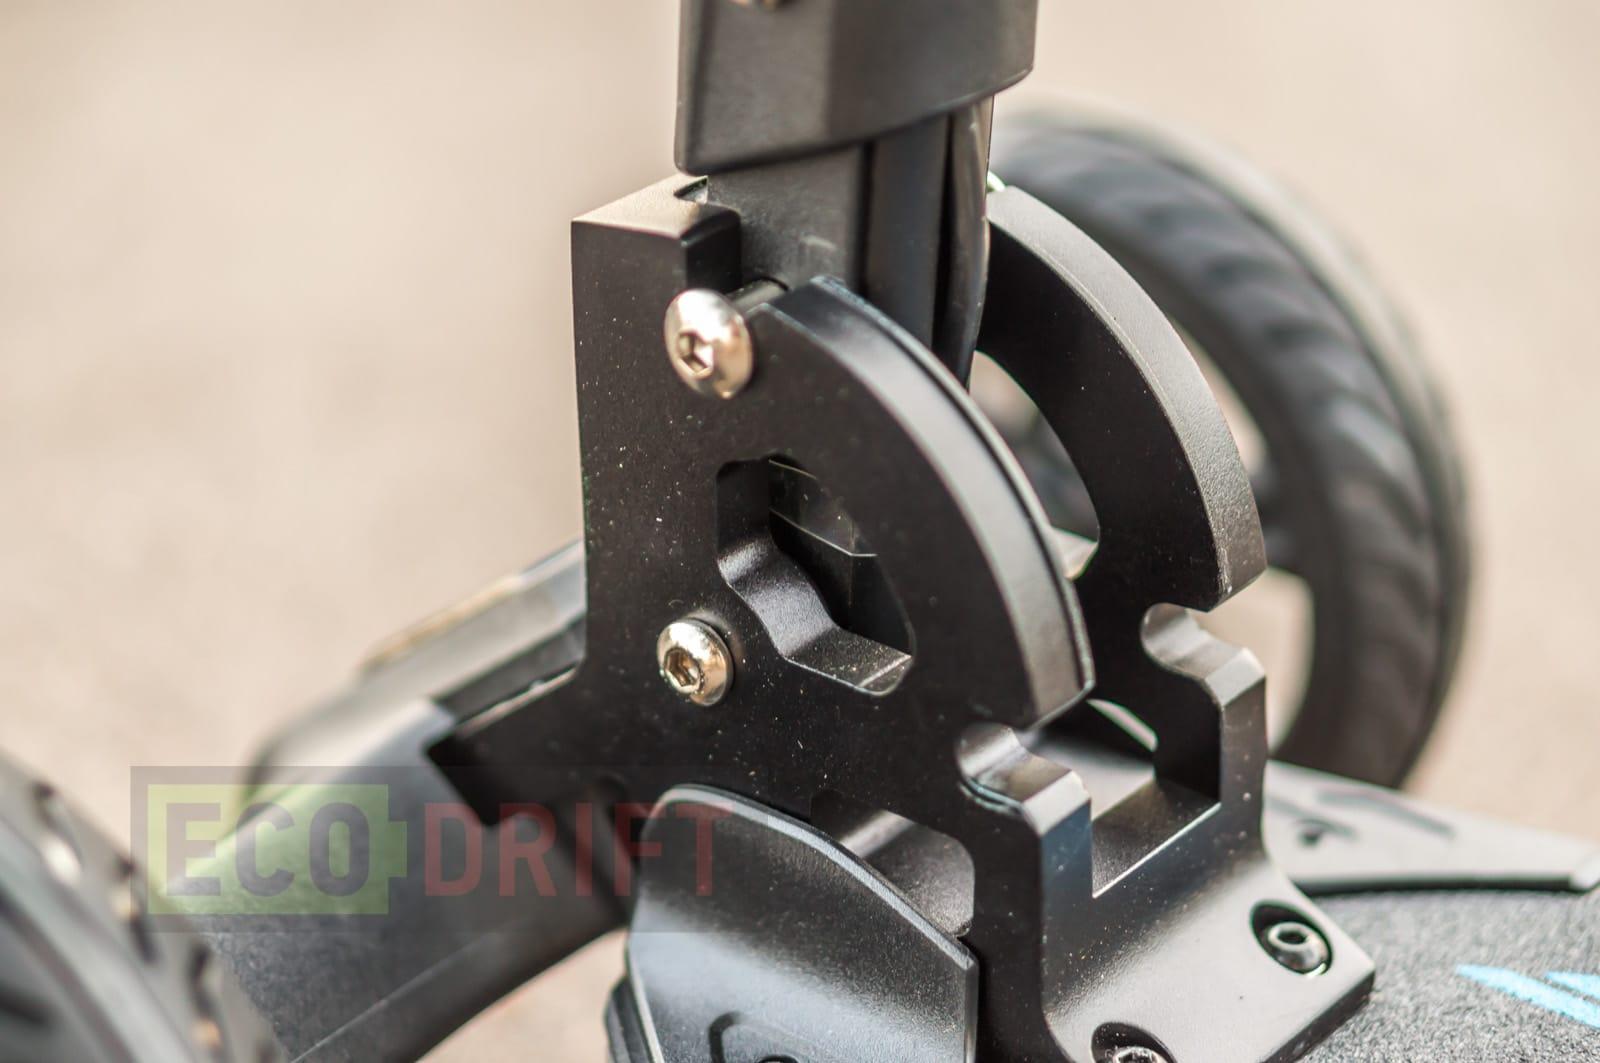 Краткий обзор электросамоката Inmotion T3. Однорукий «бандит» на трех колесах